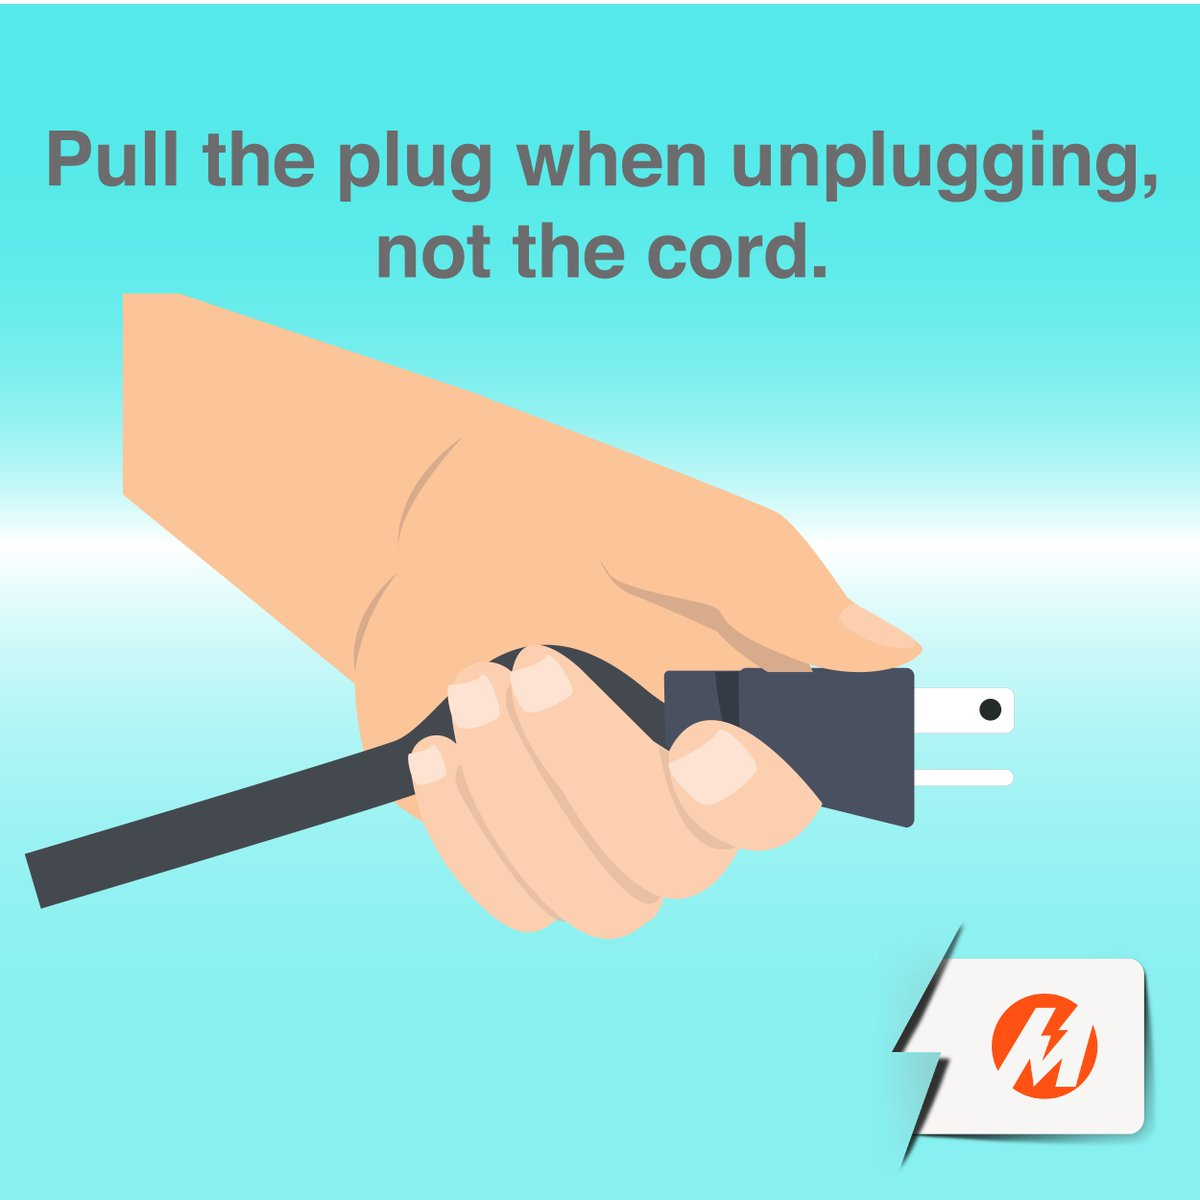 'Di lang feelings ang dapat hinuhugot, pati appliances!Kung mag-a-unplug, make sure sa plug nakahawak, hindi sa cord https://t.co/Ajz0XGKUCQ